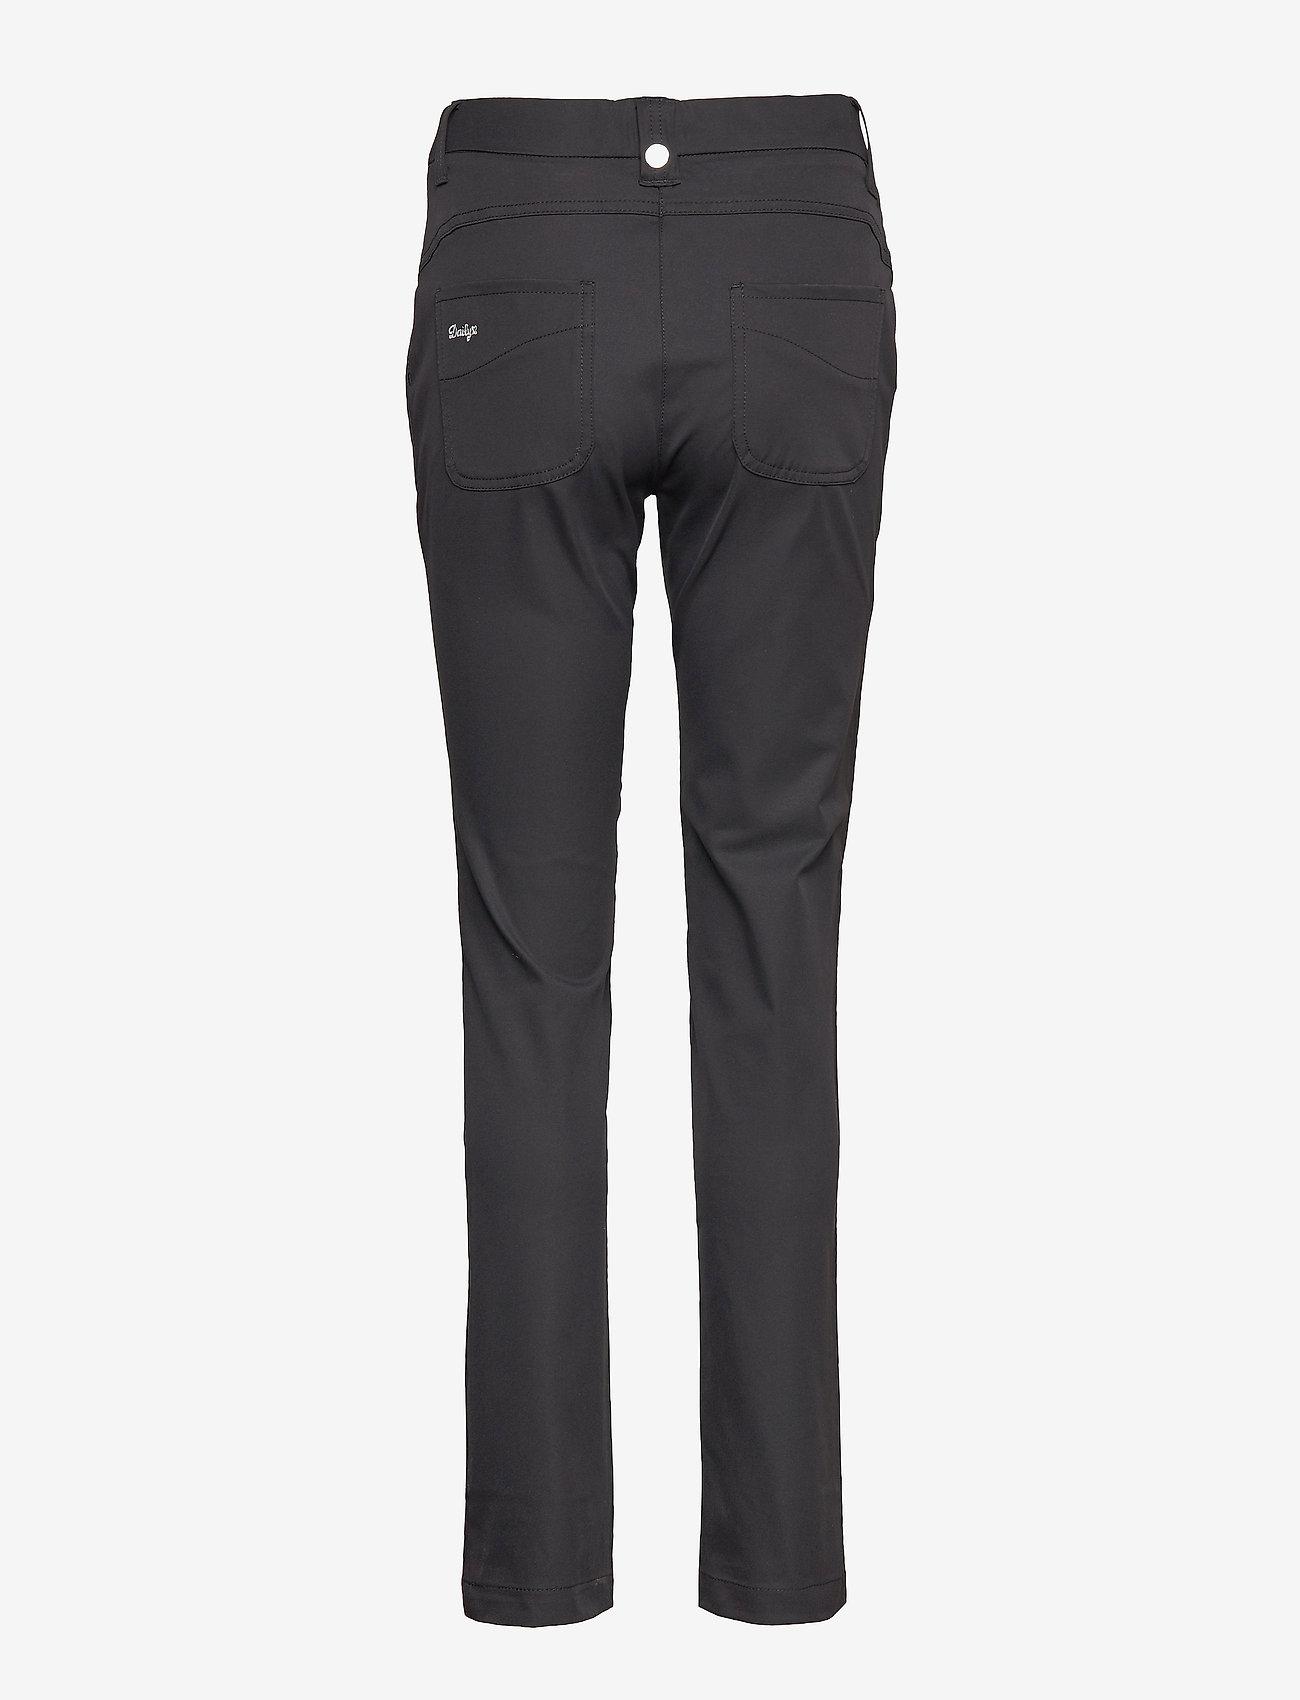 Lyric Pants 32 Inch (Black) - Daily Sports kMnbCa